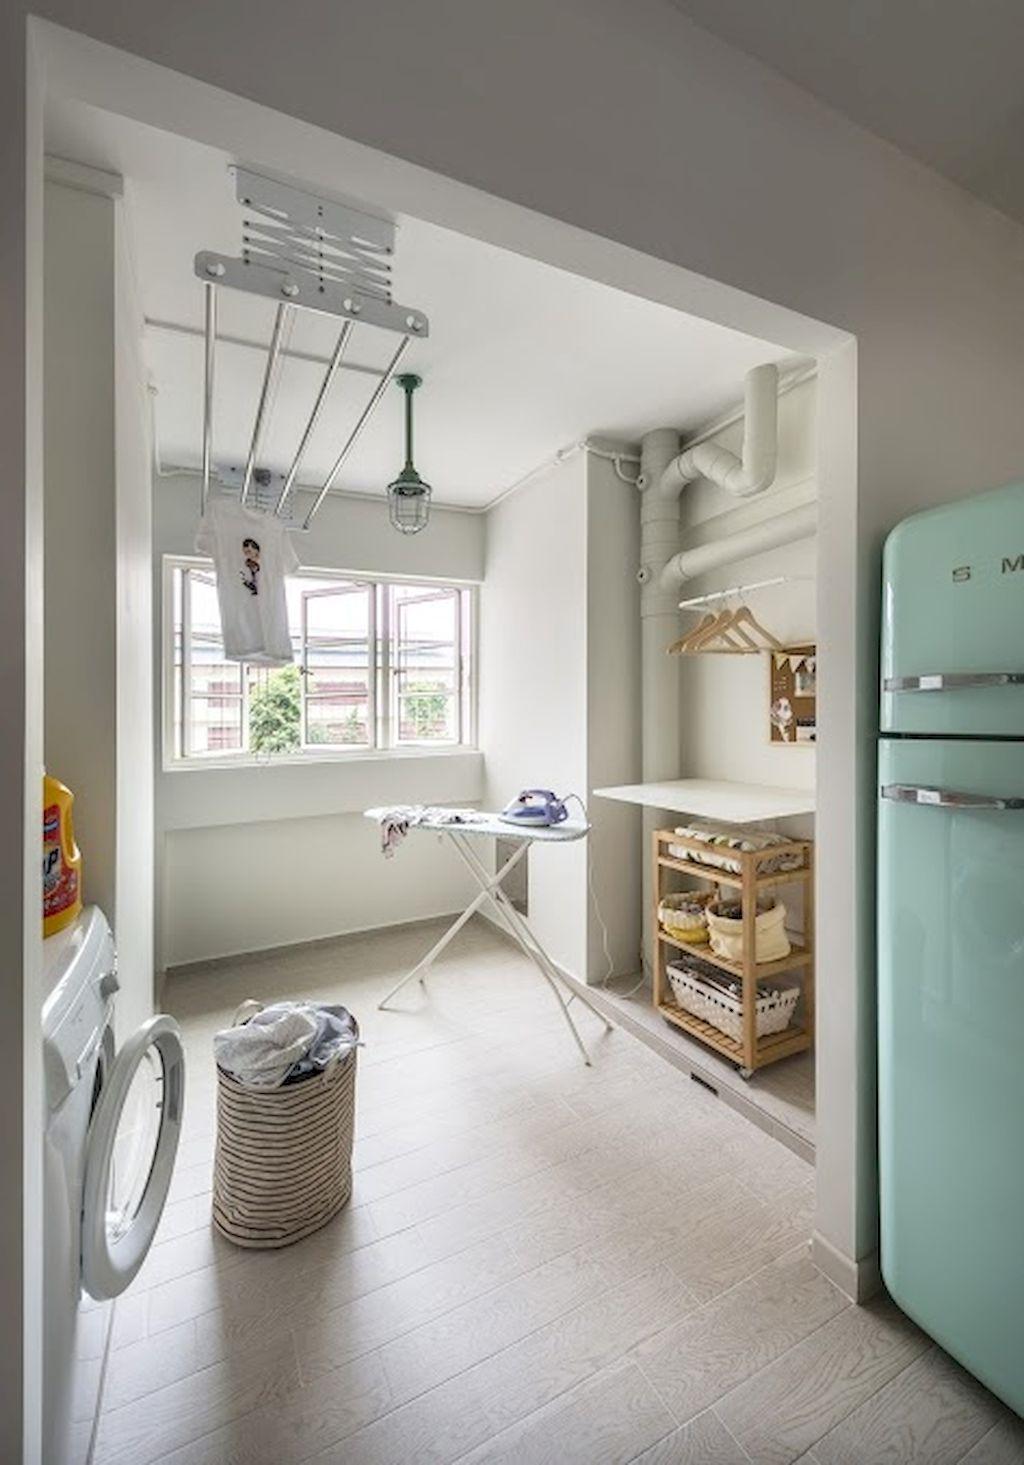 Minimalist Hdb Design: 20+ Scandinavian Laundry Room Design Ideas For Your